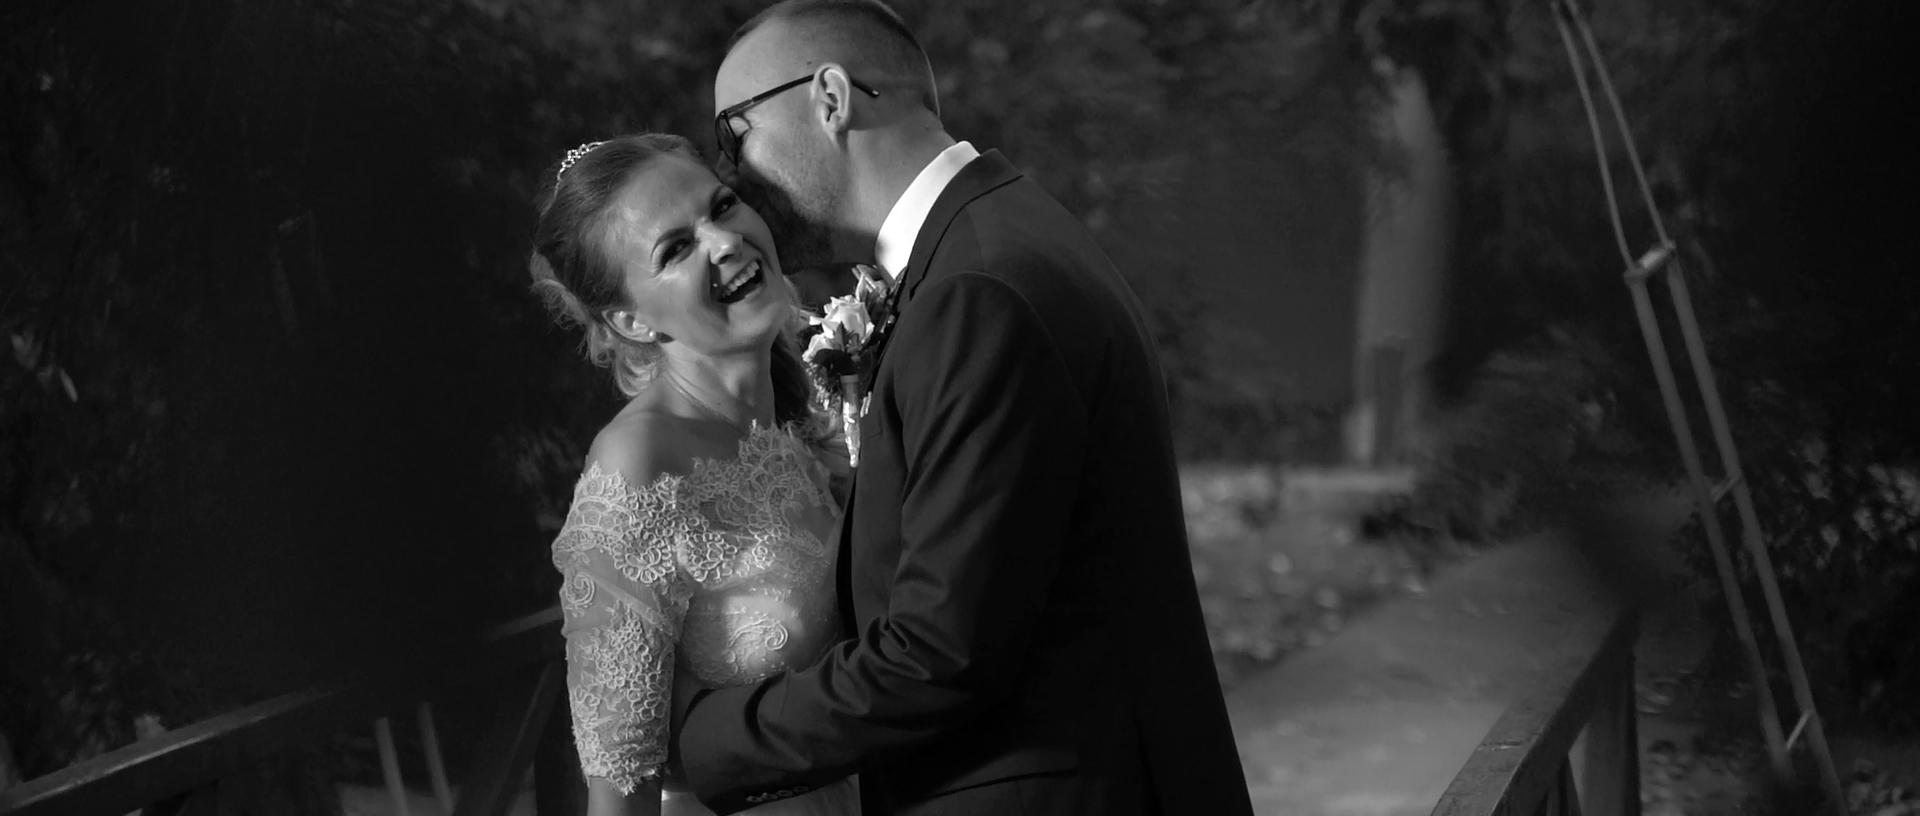 Ildi & Ádám – Esküvői film